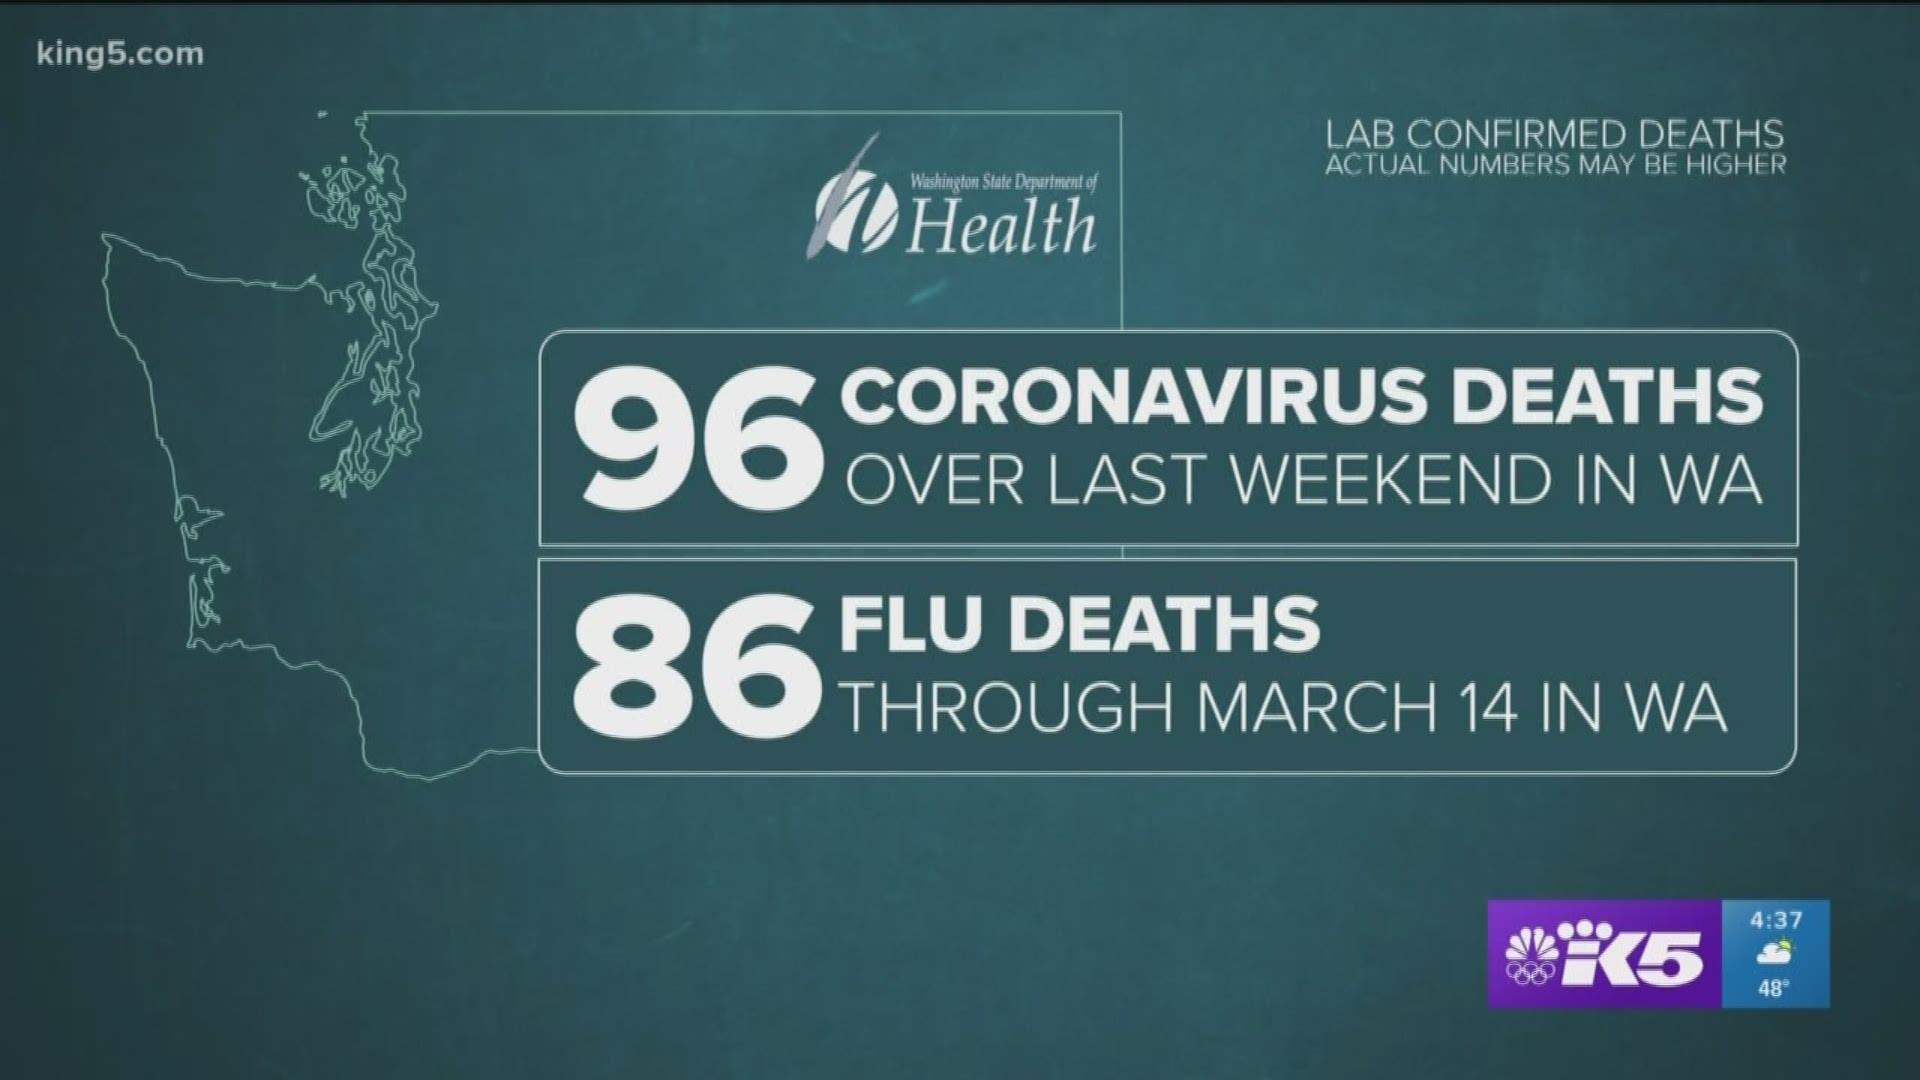 More Coronavirus Deaths Than Flu Deaths Reported In Washington This Season King5 Com